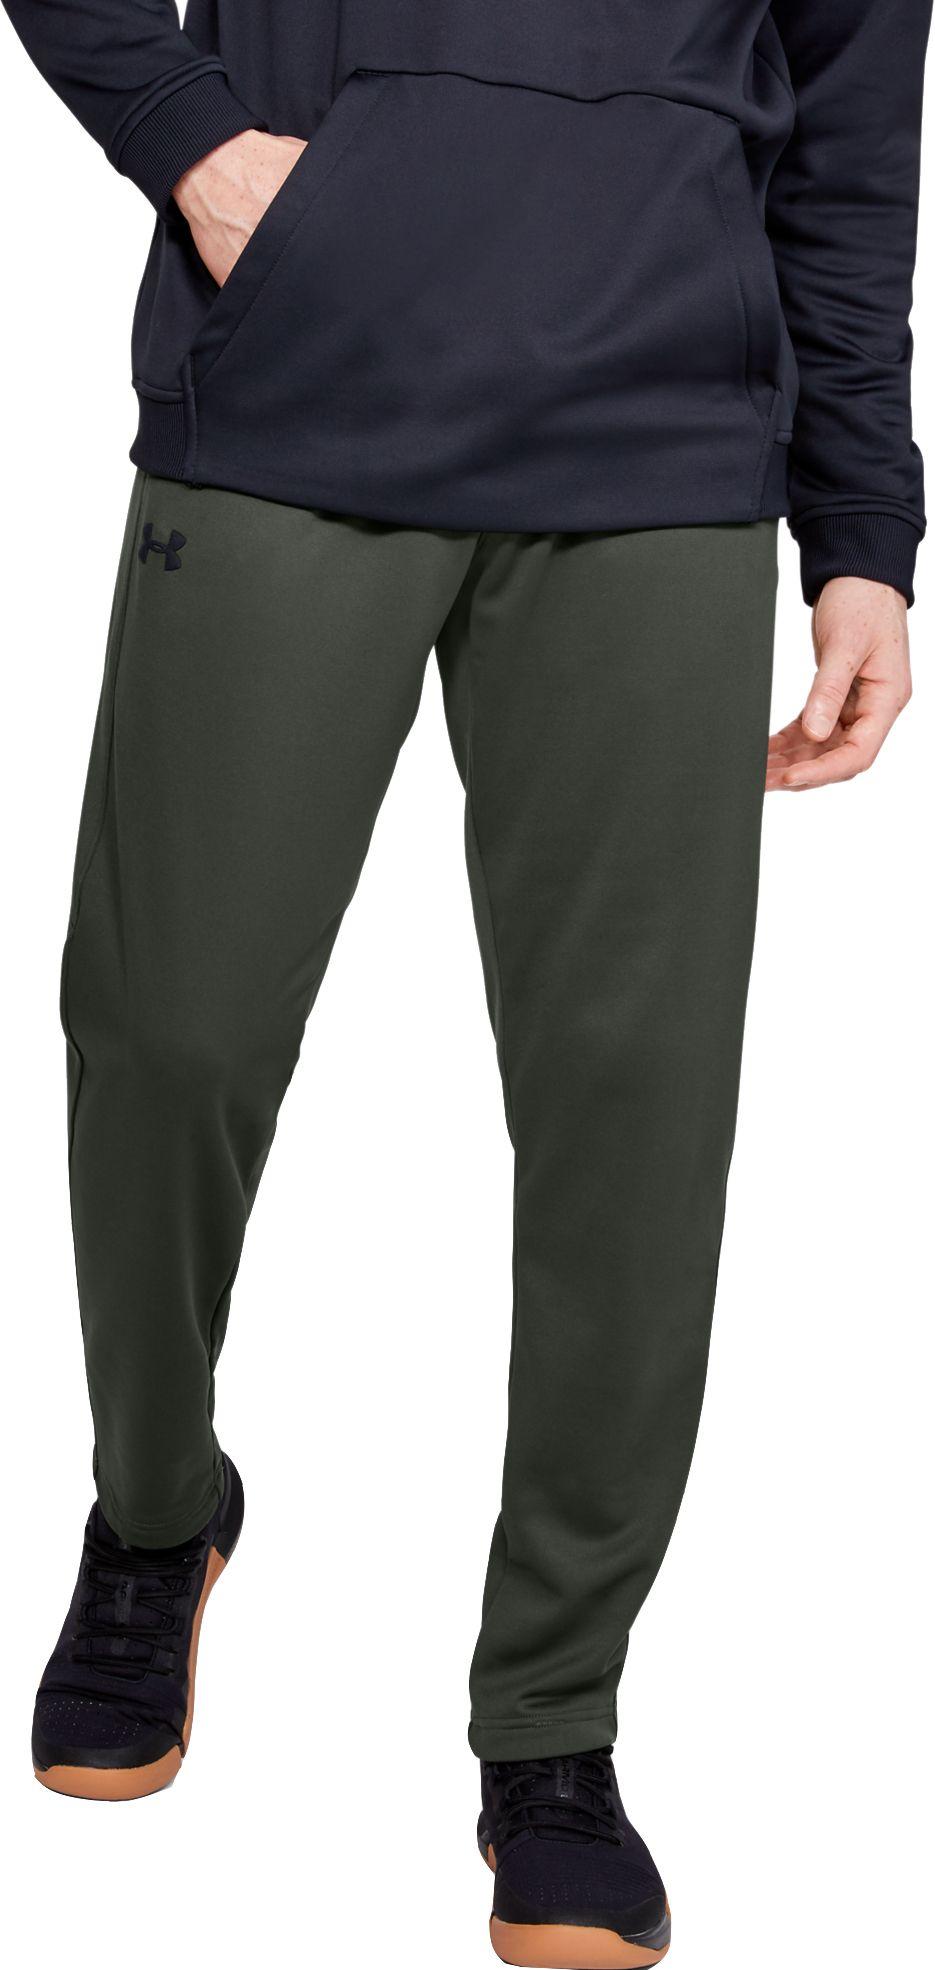 Men/'s Under Armour Cold Gear Storm Loose Fit Sweat Pants Water Resistant